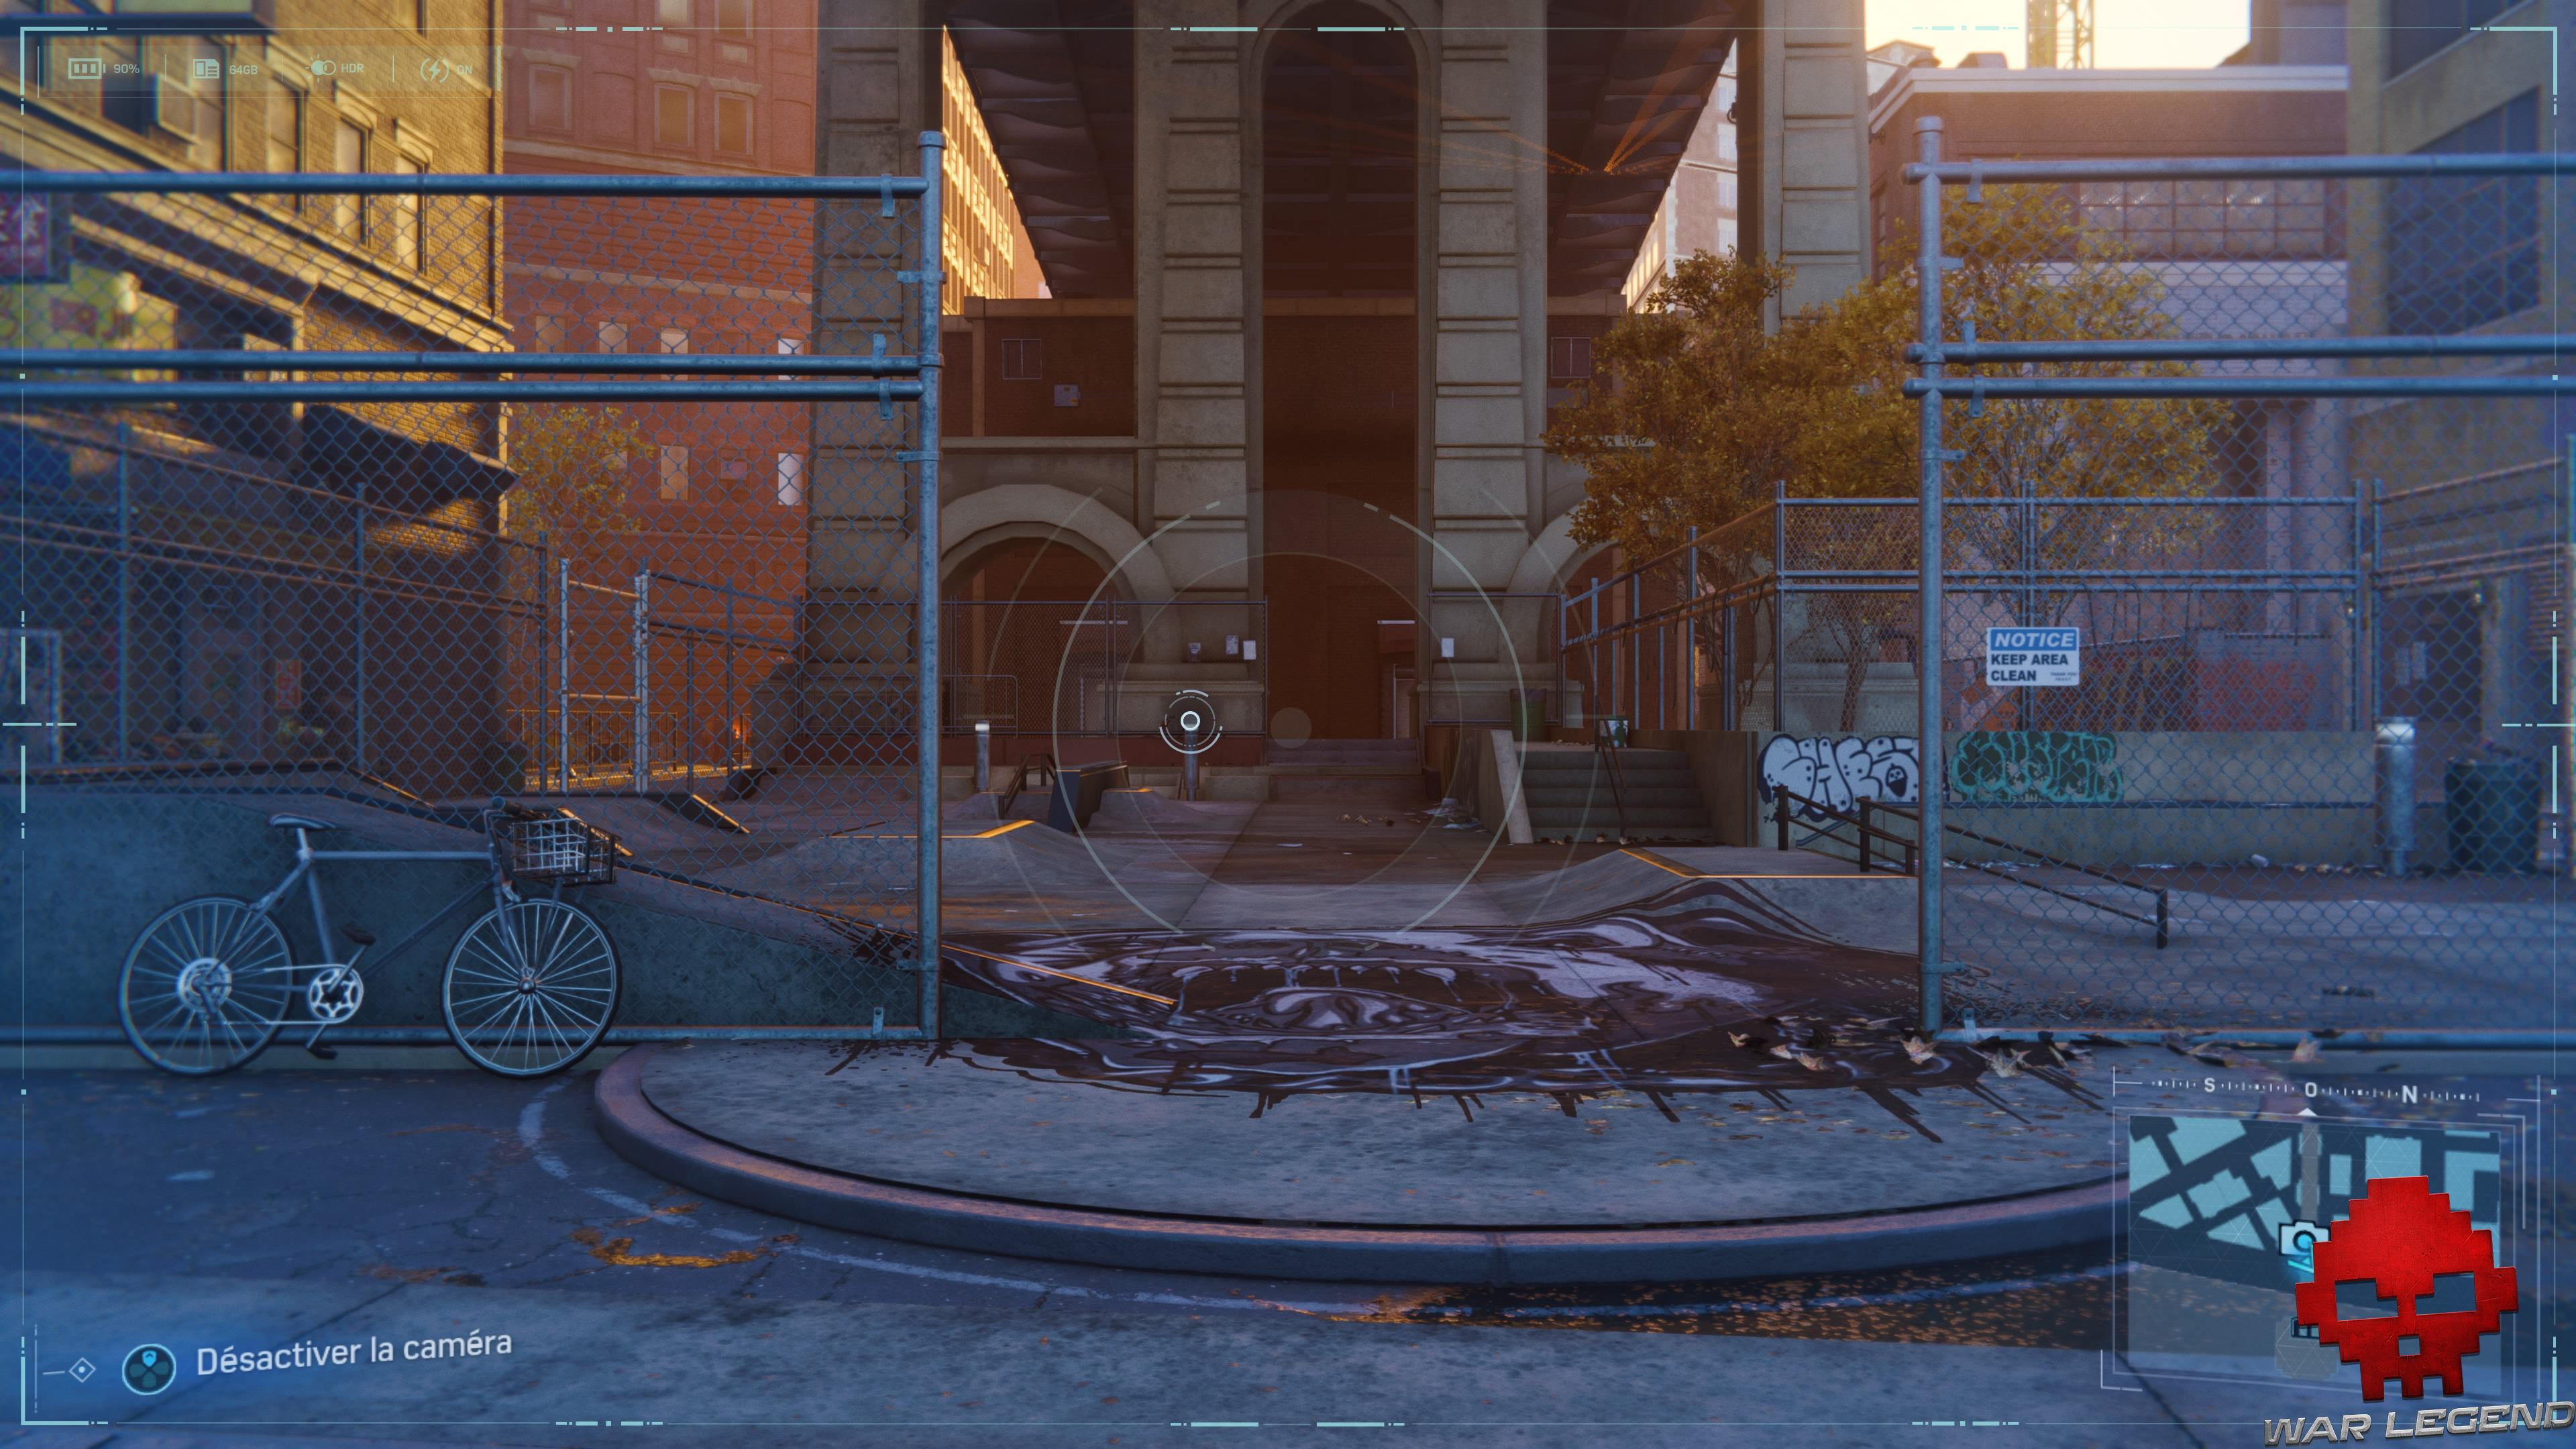 Spider-Man photo secrète skatepark de coleman's square